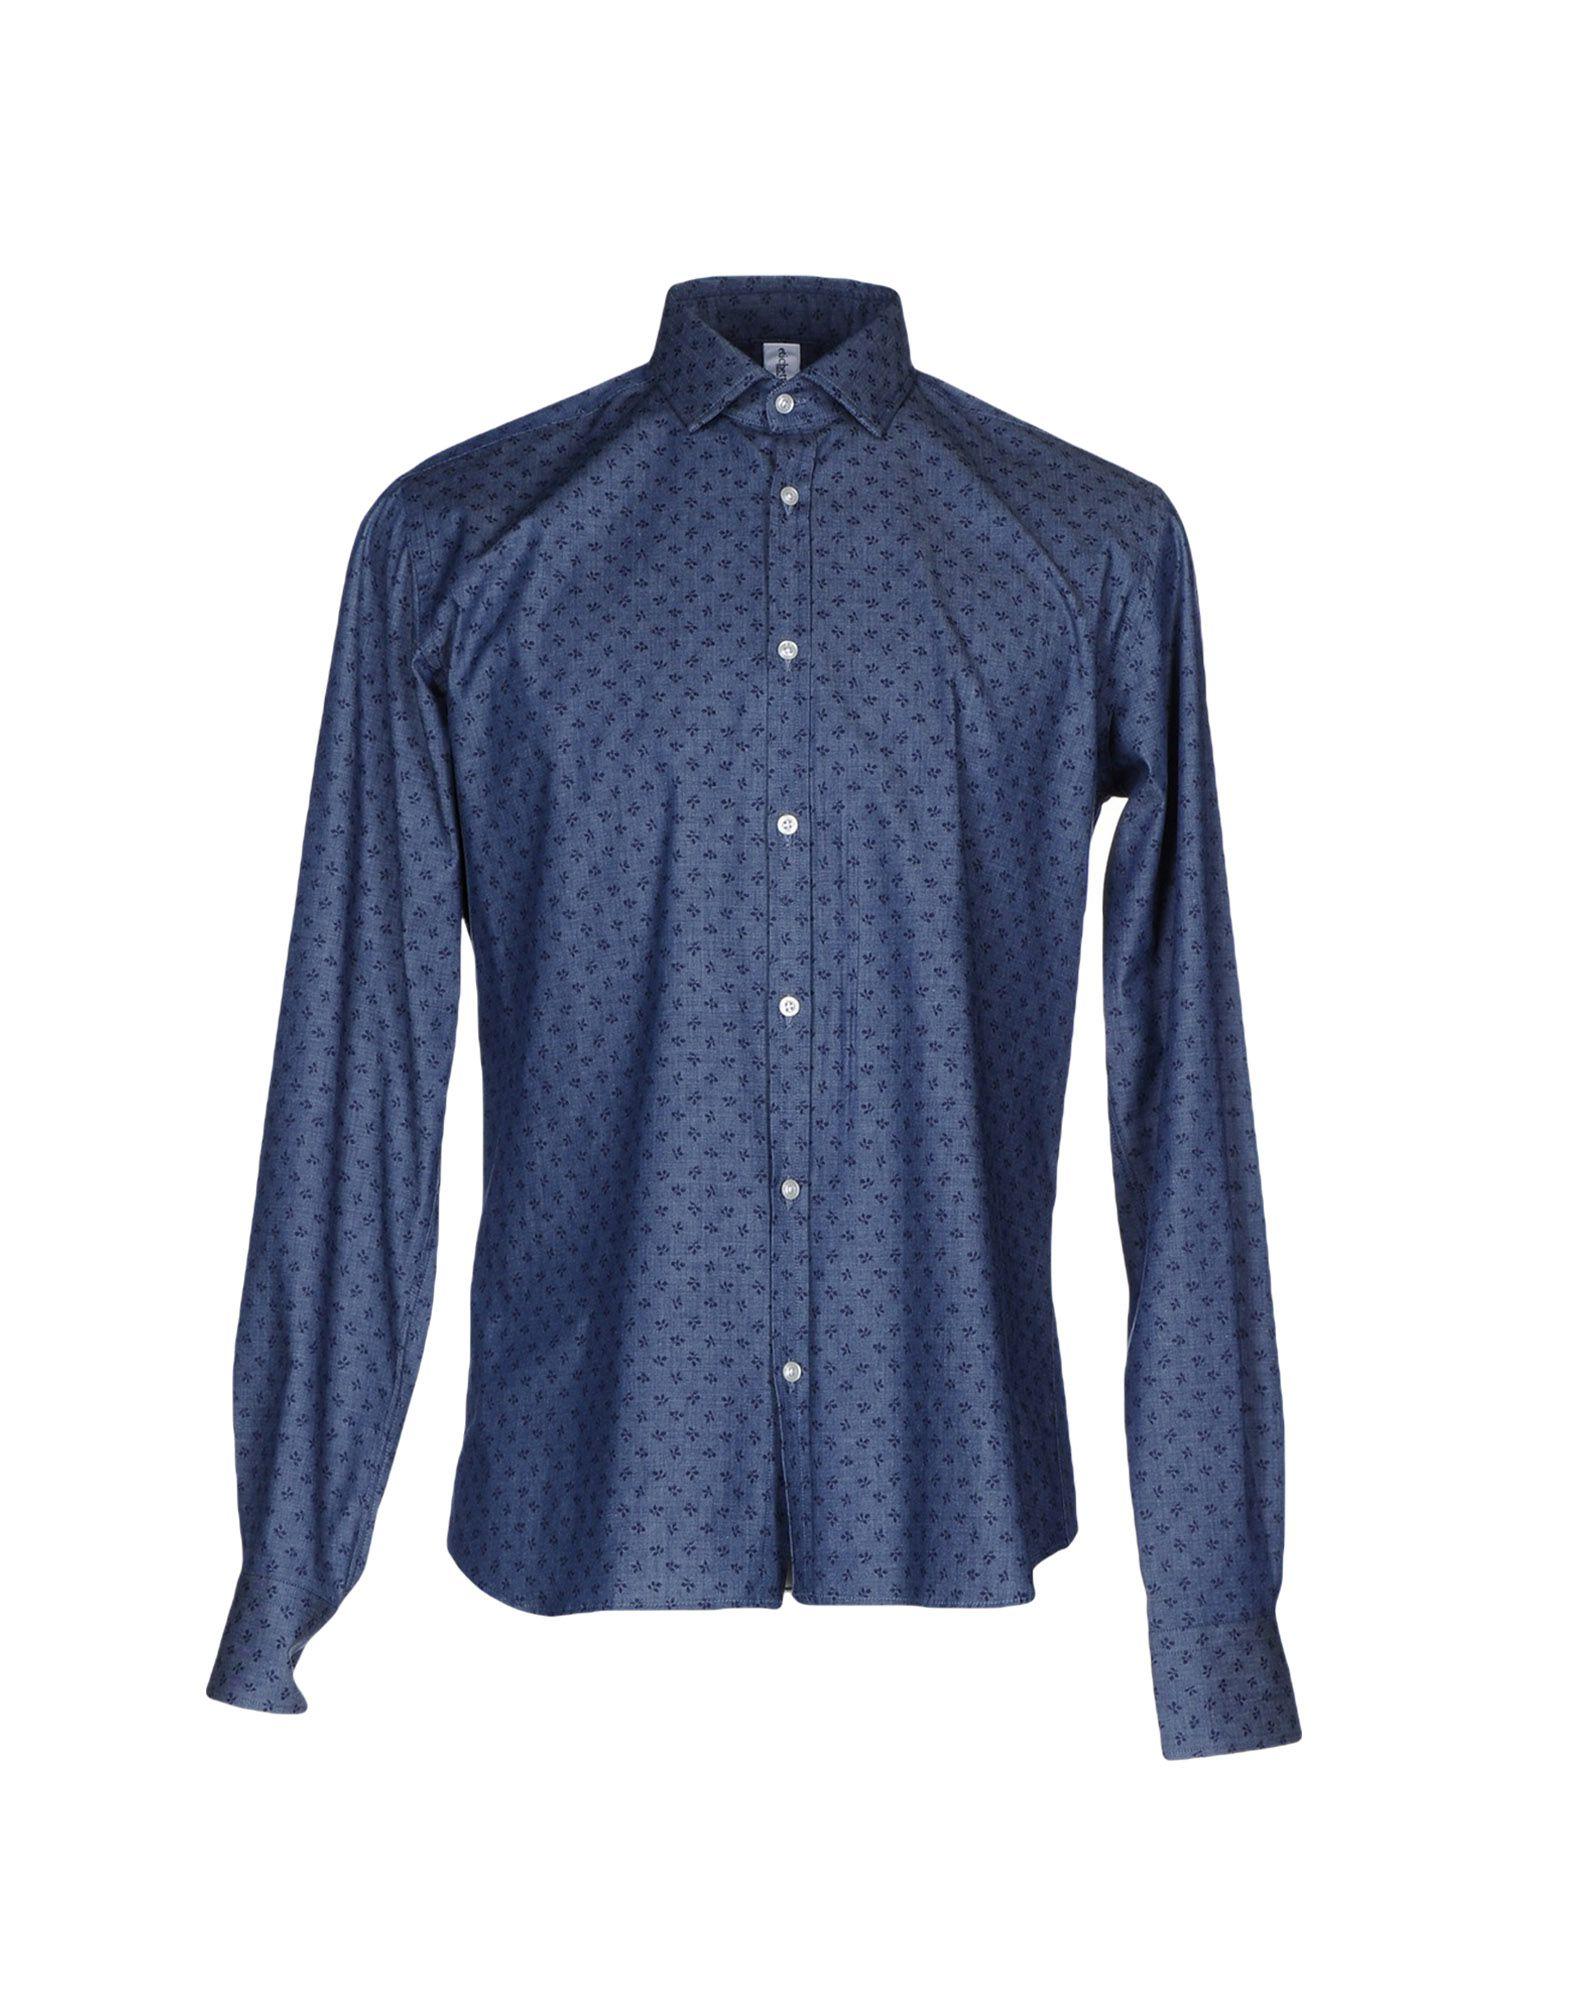 цена ETICHETTA 35 Джинсовая рубашка онлайн в 2017 году